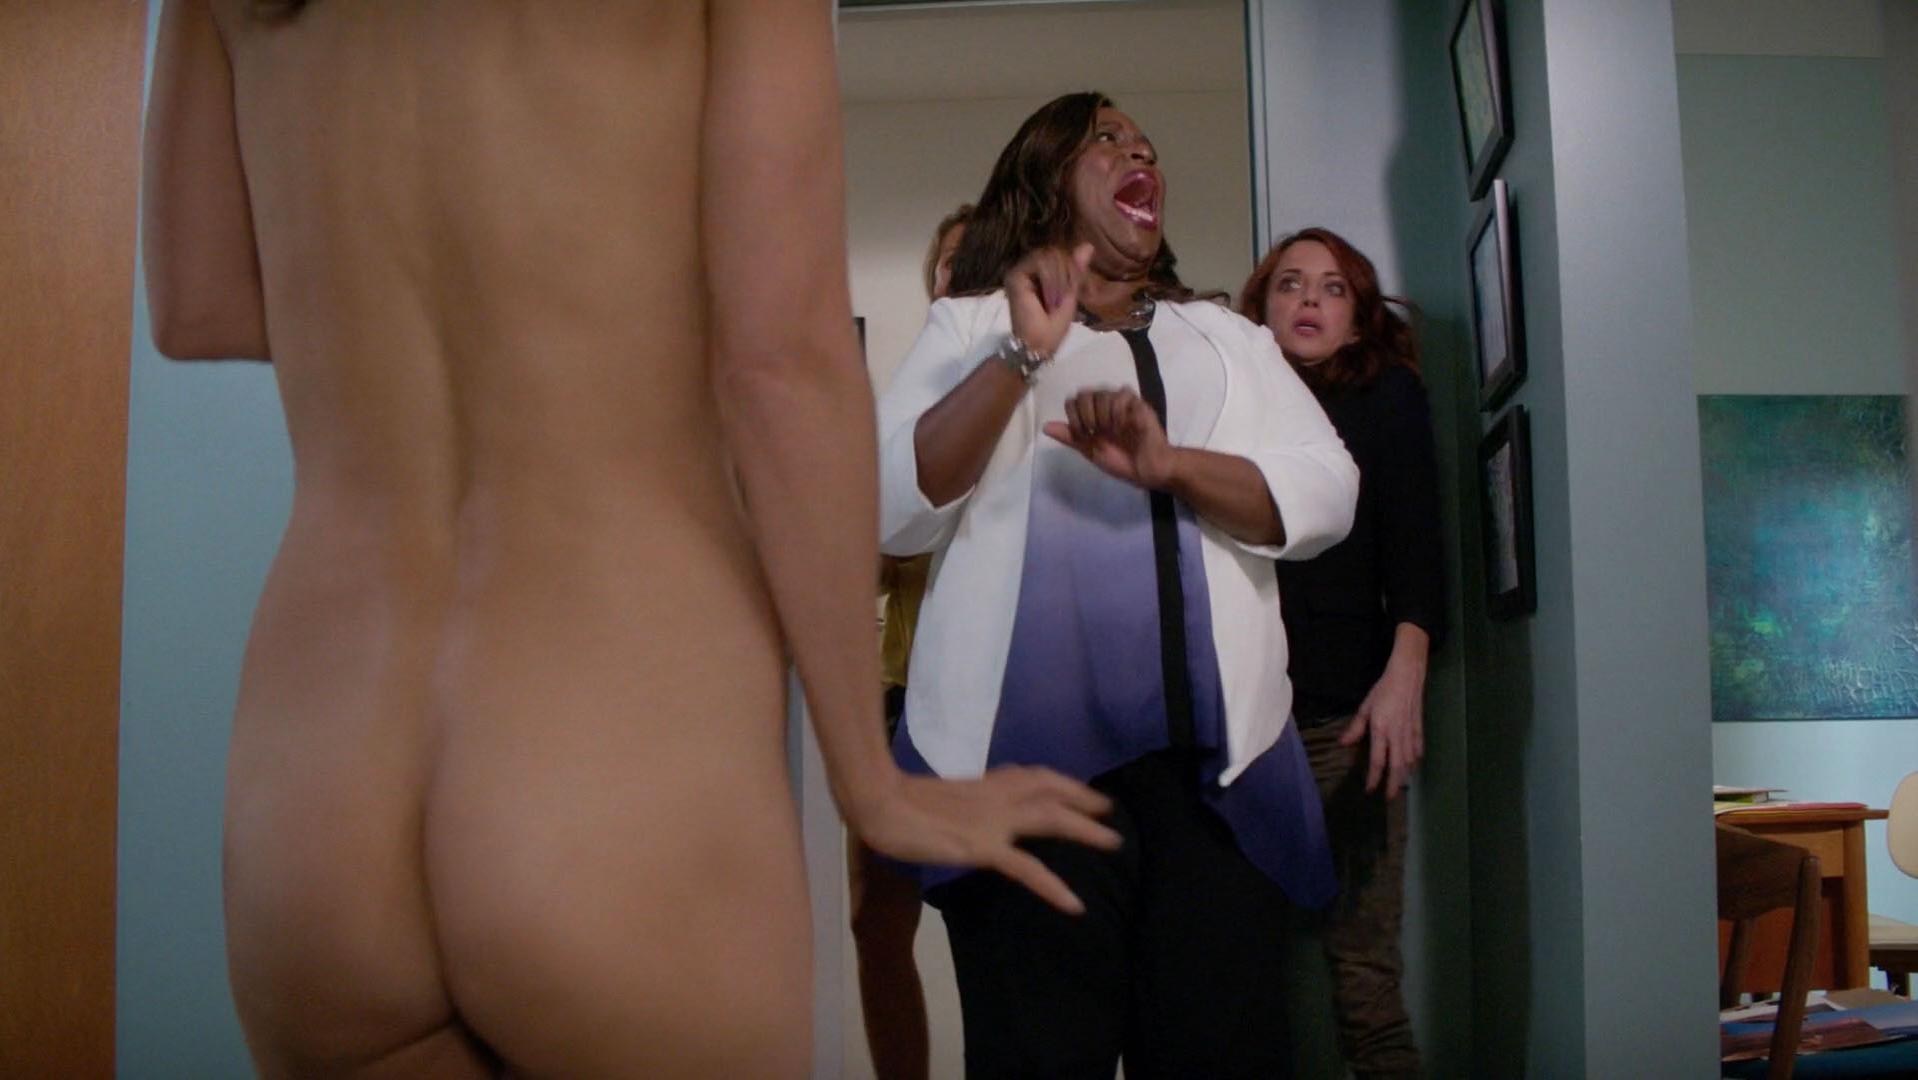 Gasoline reccomend Lisa edelstein nude butt